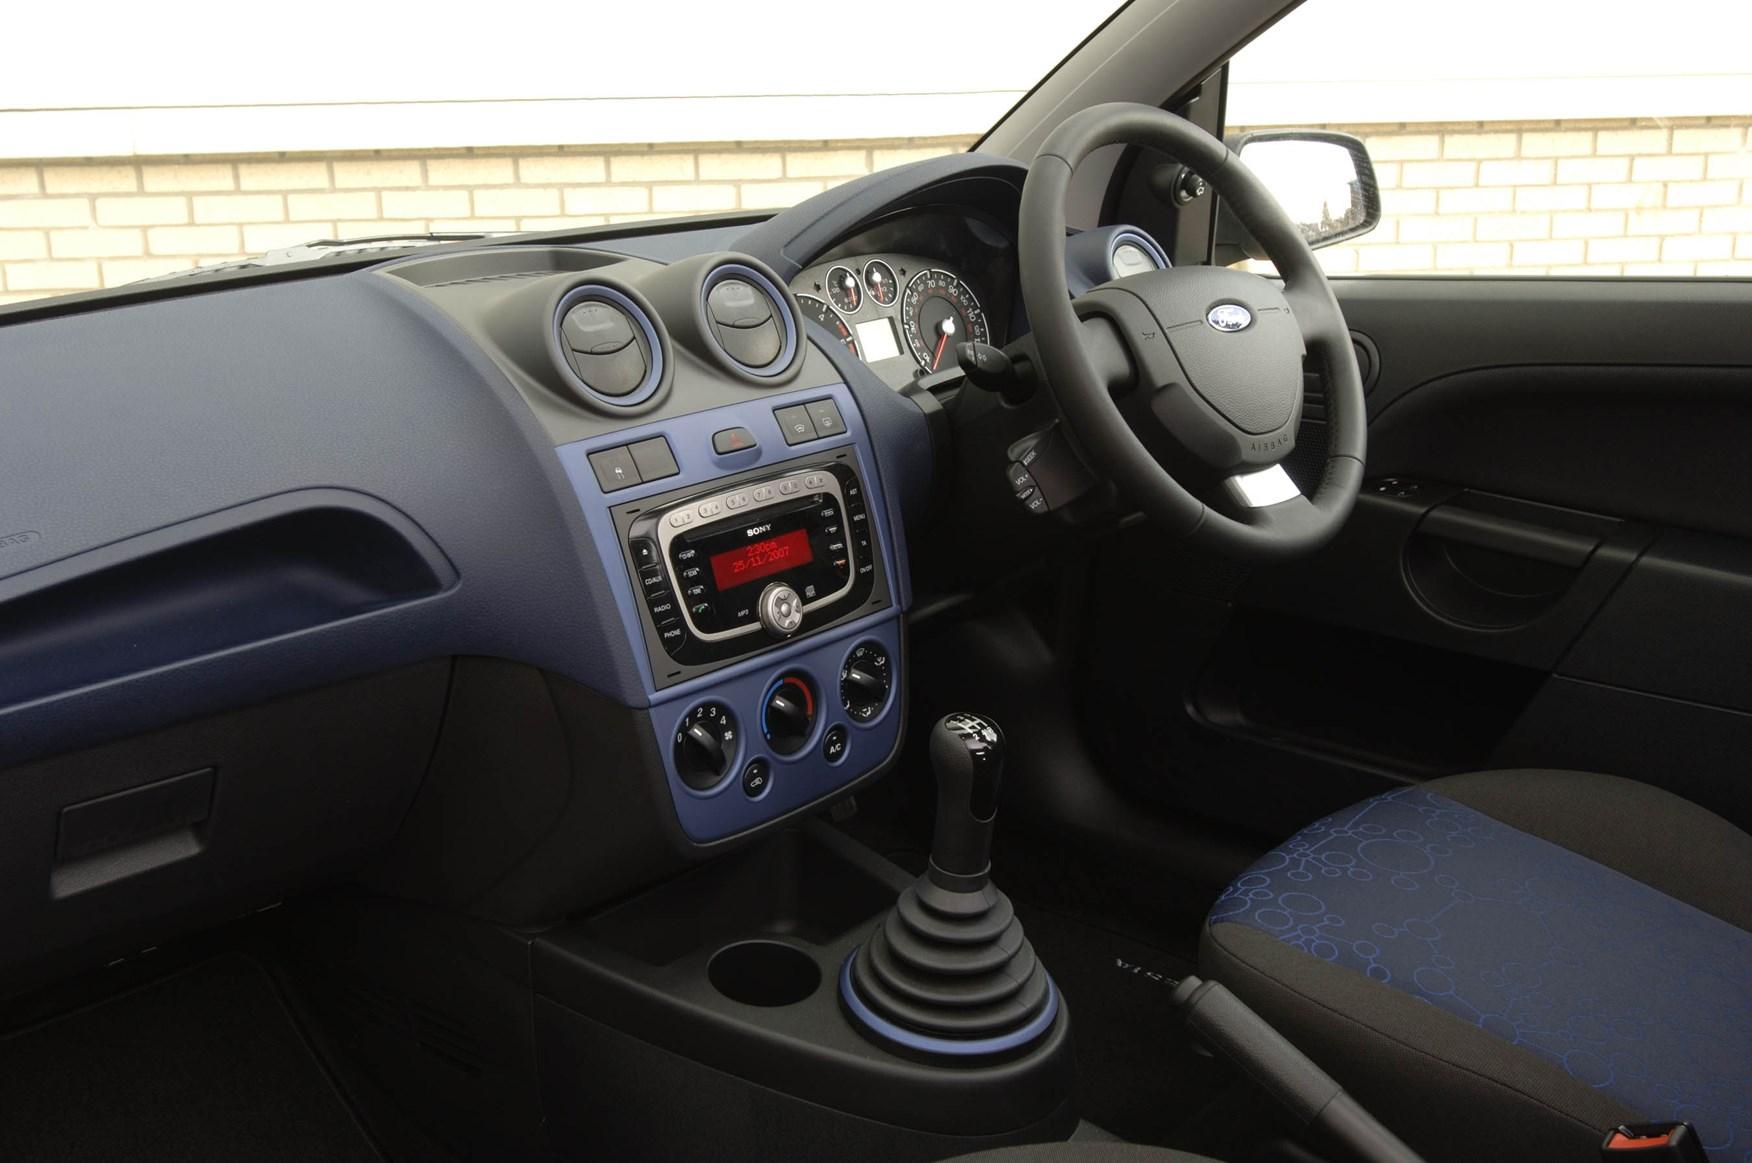 Ford Fiesta Hatchback 2002 2008 Features Equipment